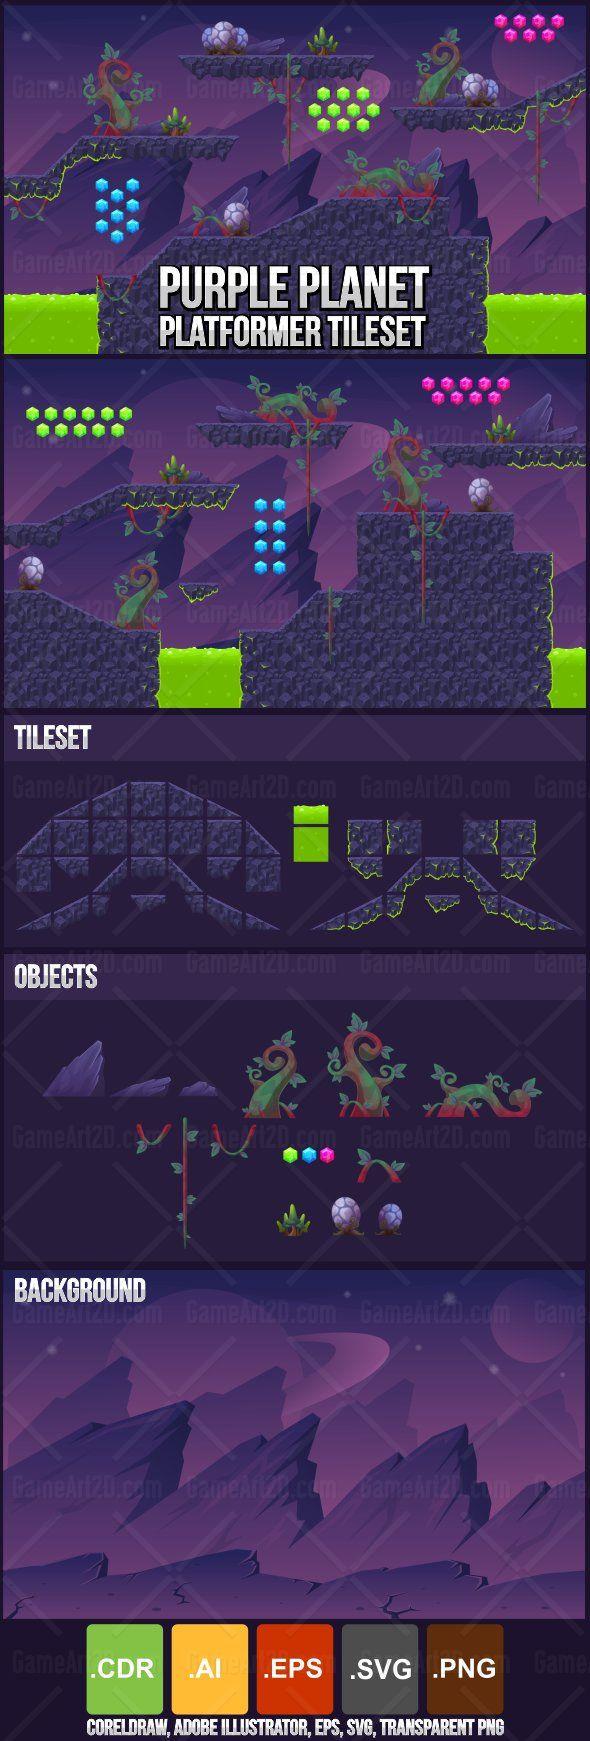 Purple Planet - Platformer Tileset by pzUH on DeviantArt